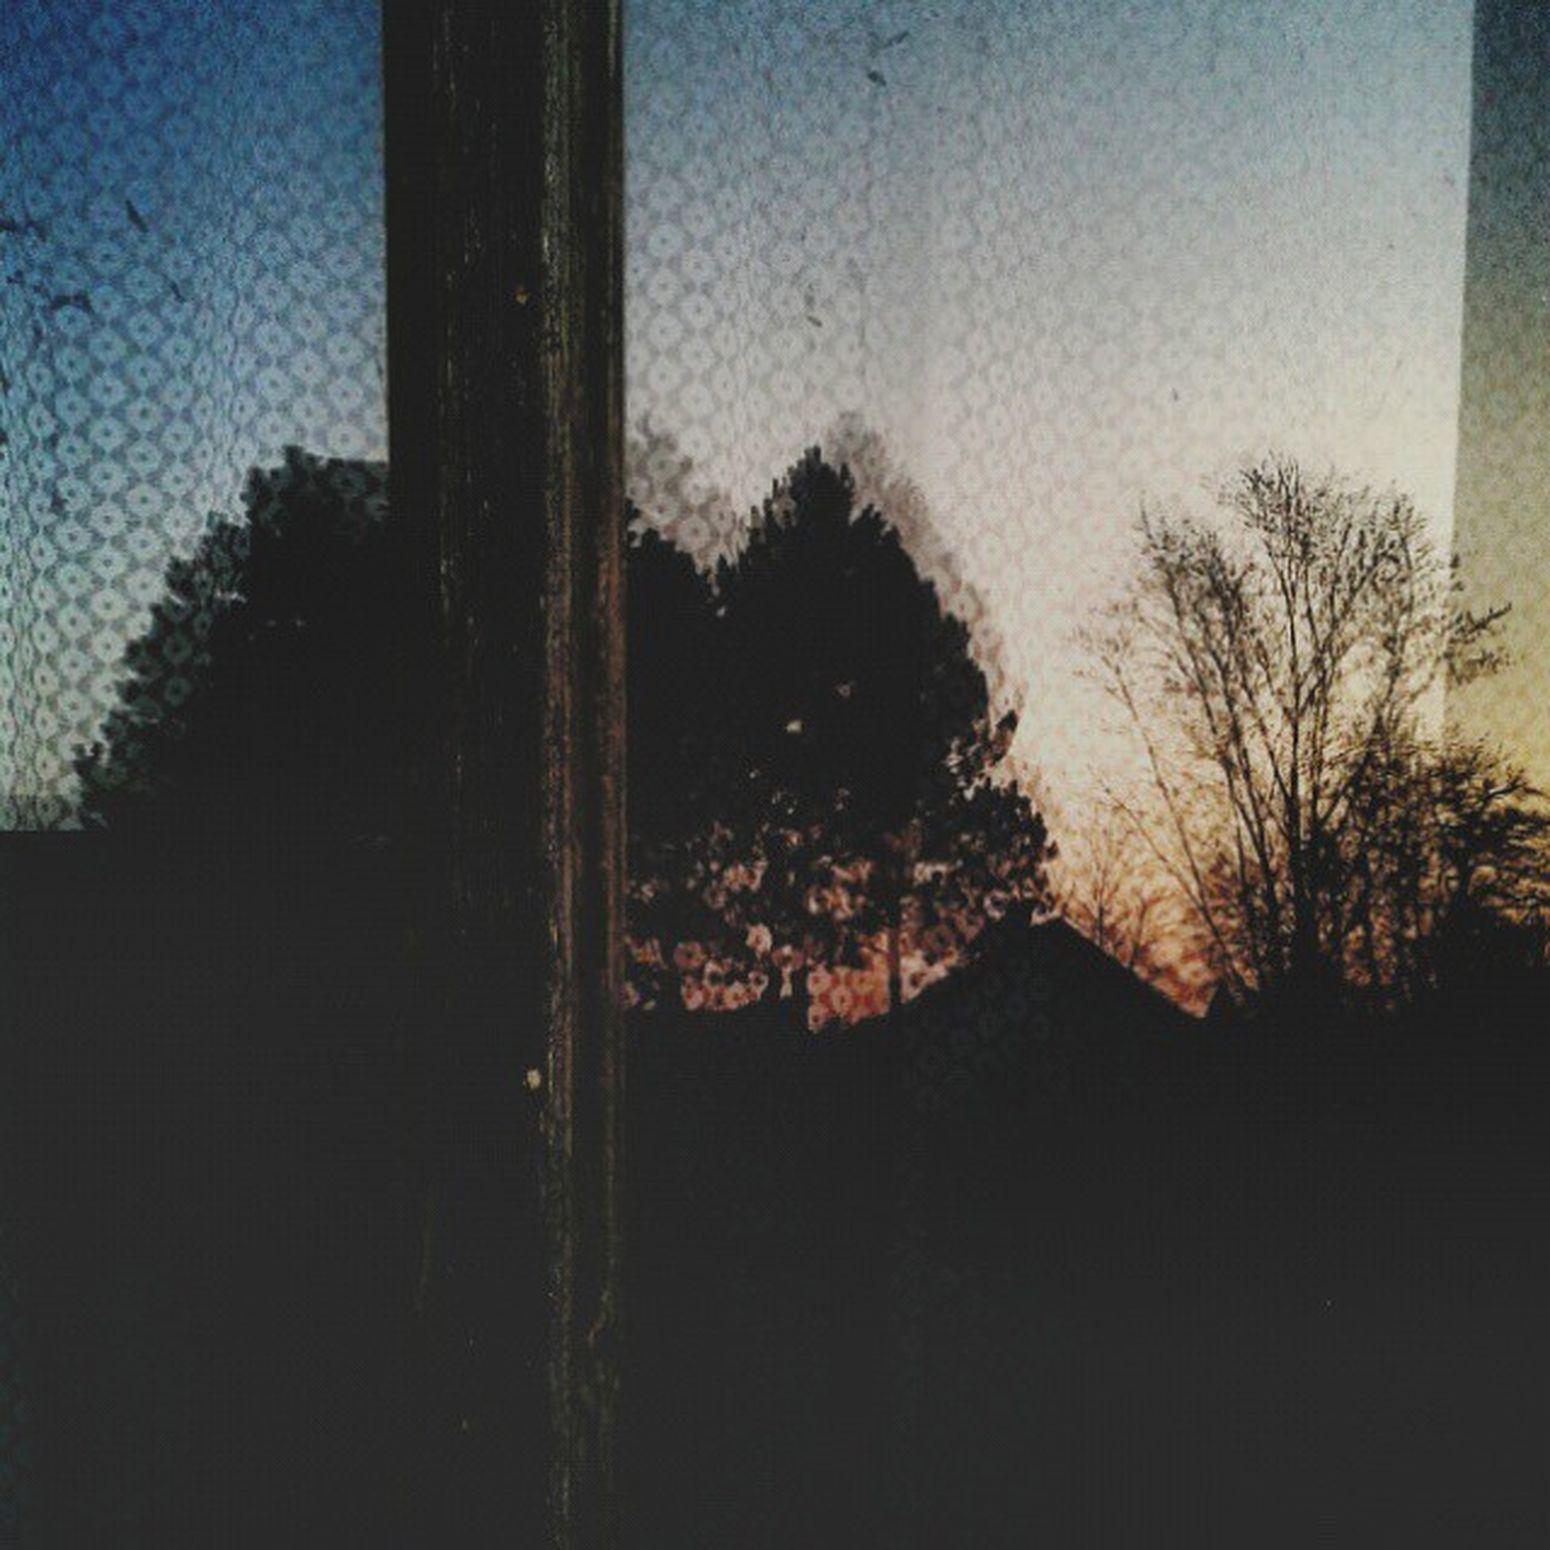 Czech Retro Photo Viilage Photography Art Window Sun Evening Tree